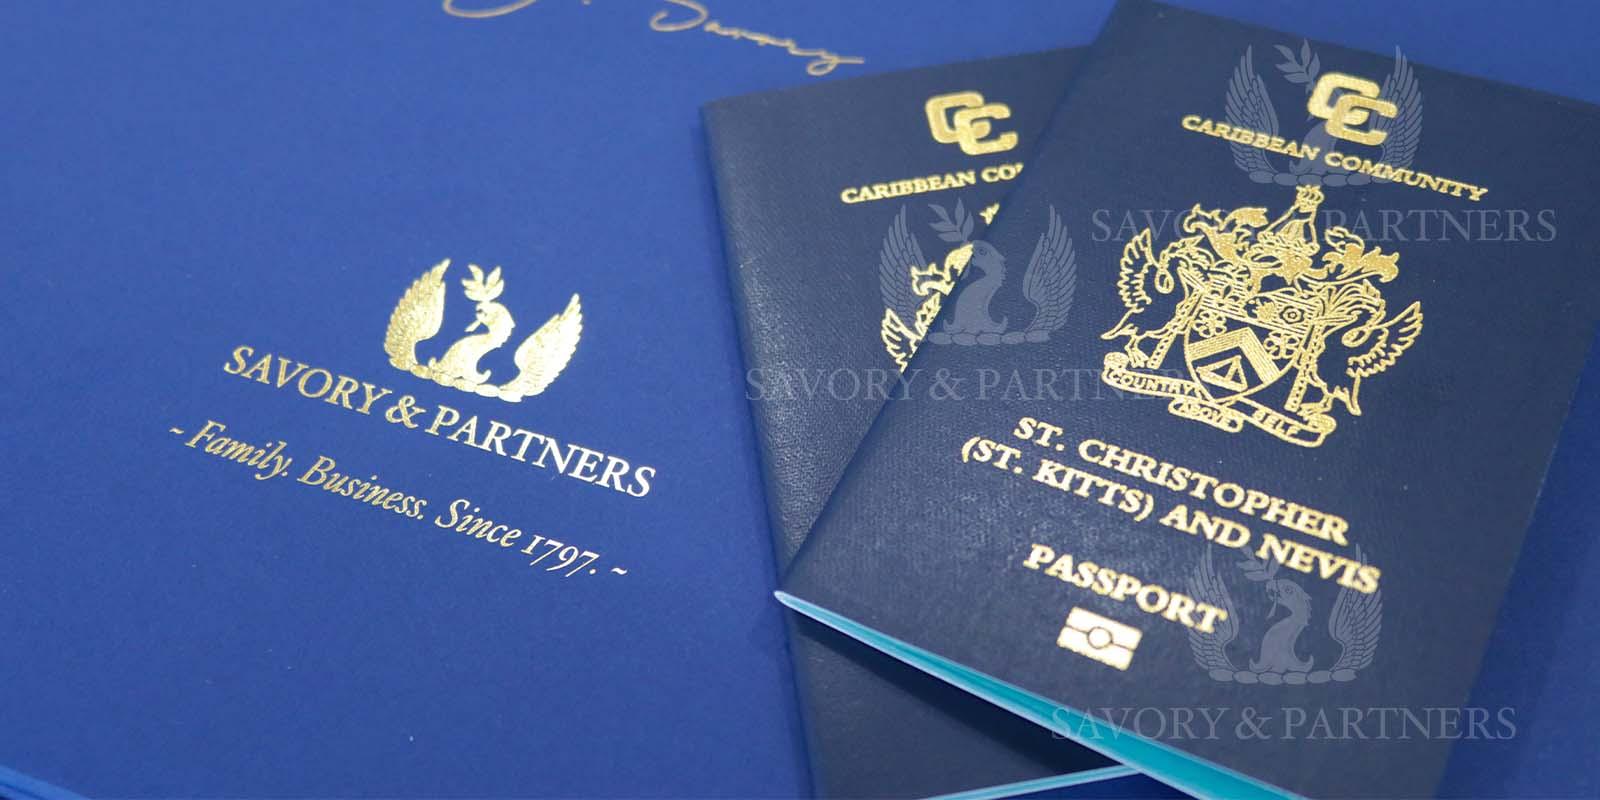 St Kitts & Nevis passports - Savory & Partners Offices, Dubai UAE.